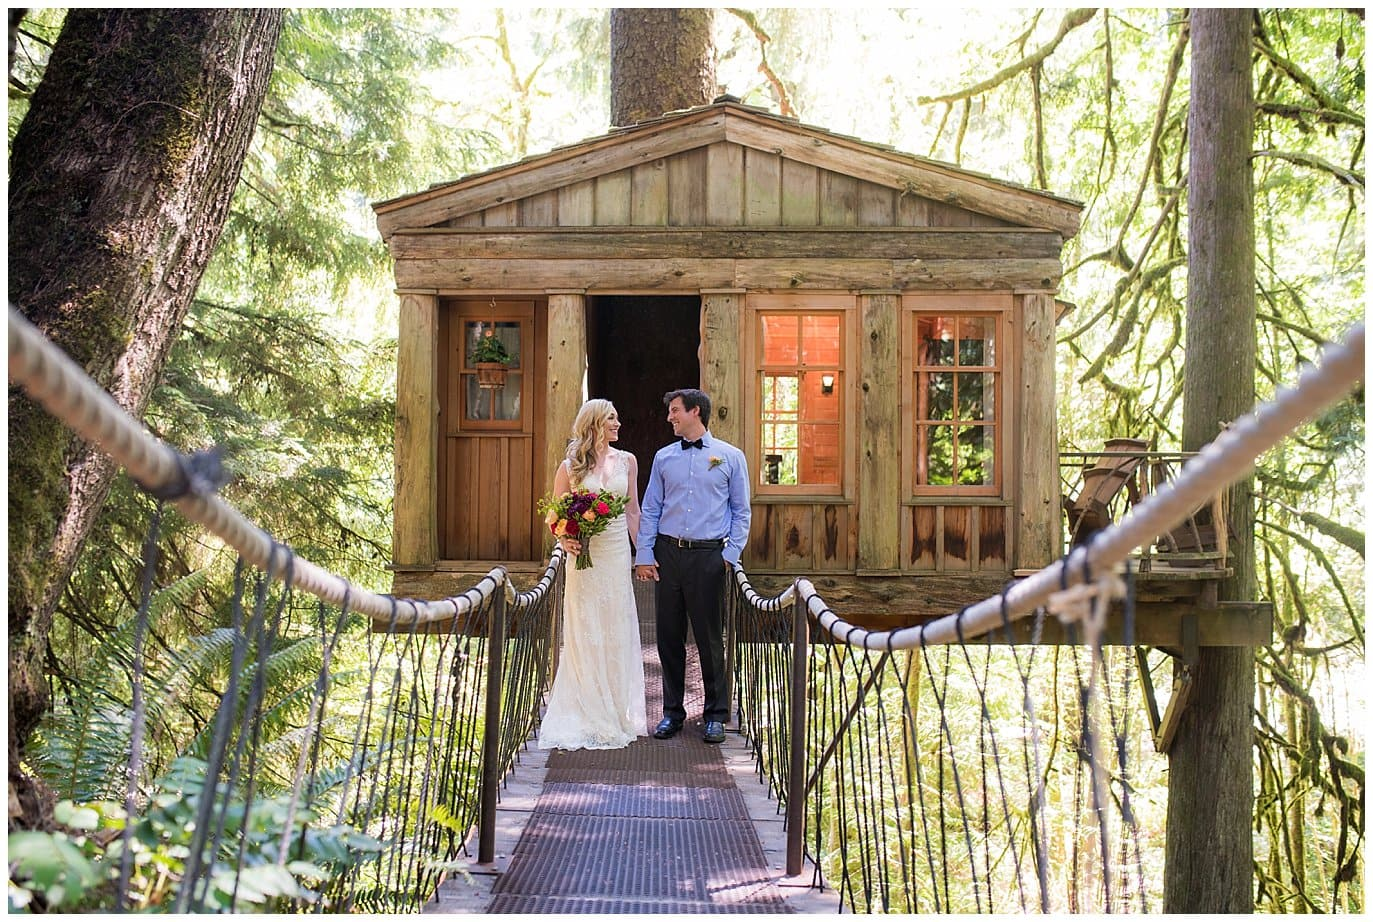 Treehouse Point  Reviews amp Photos Issaquah Washington